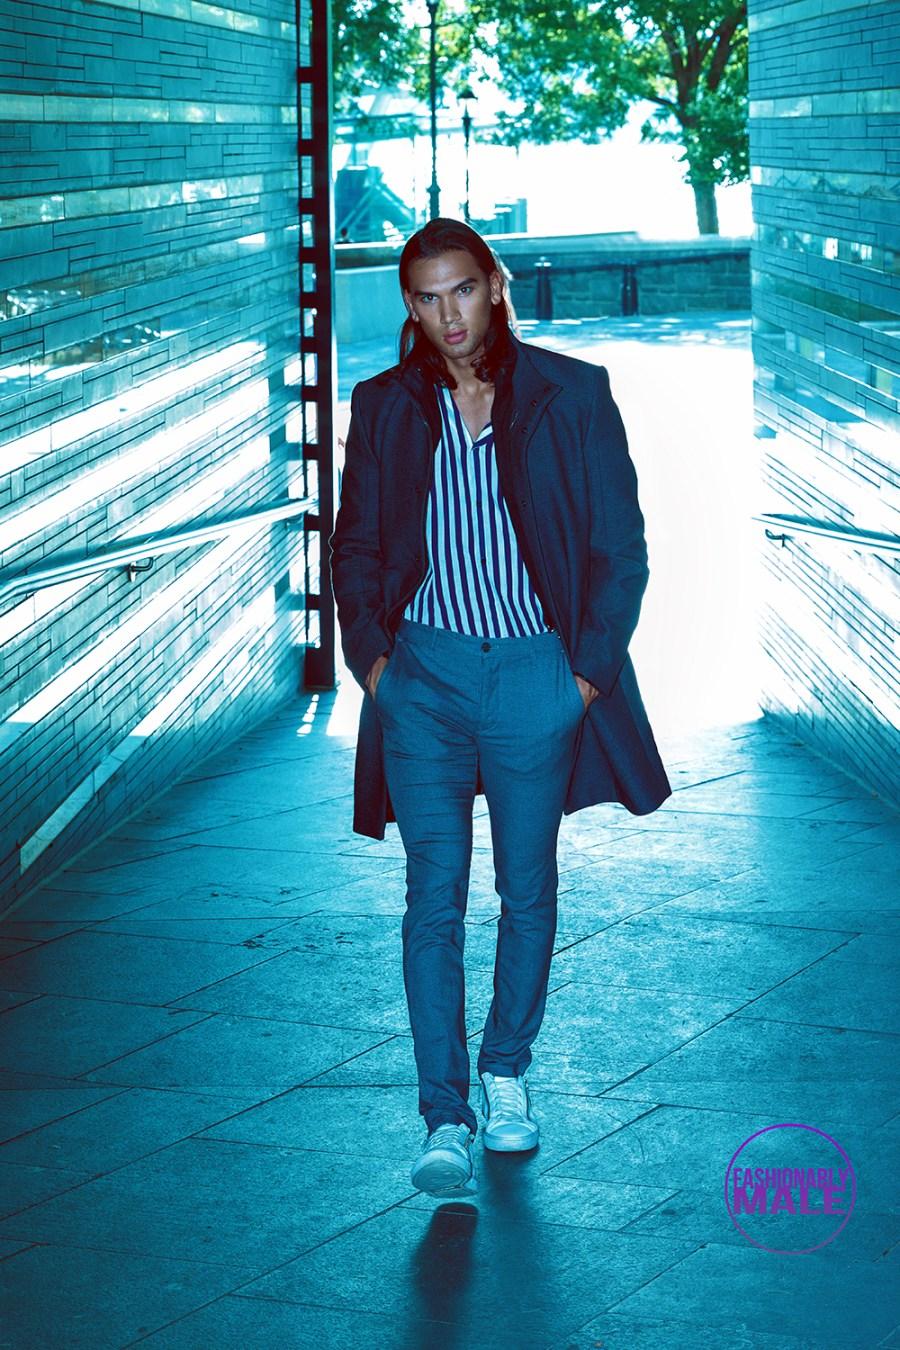 Model Sensation Chand Smith in Pics by Alex Jackson